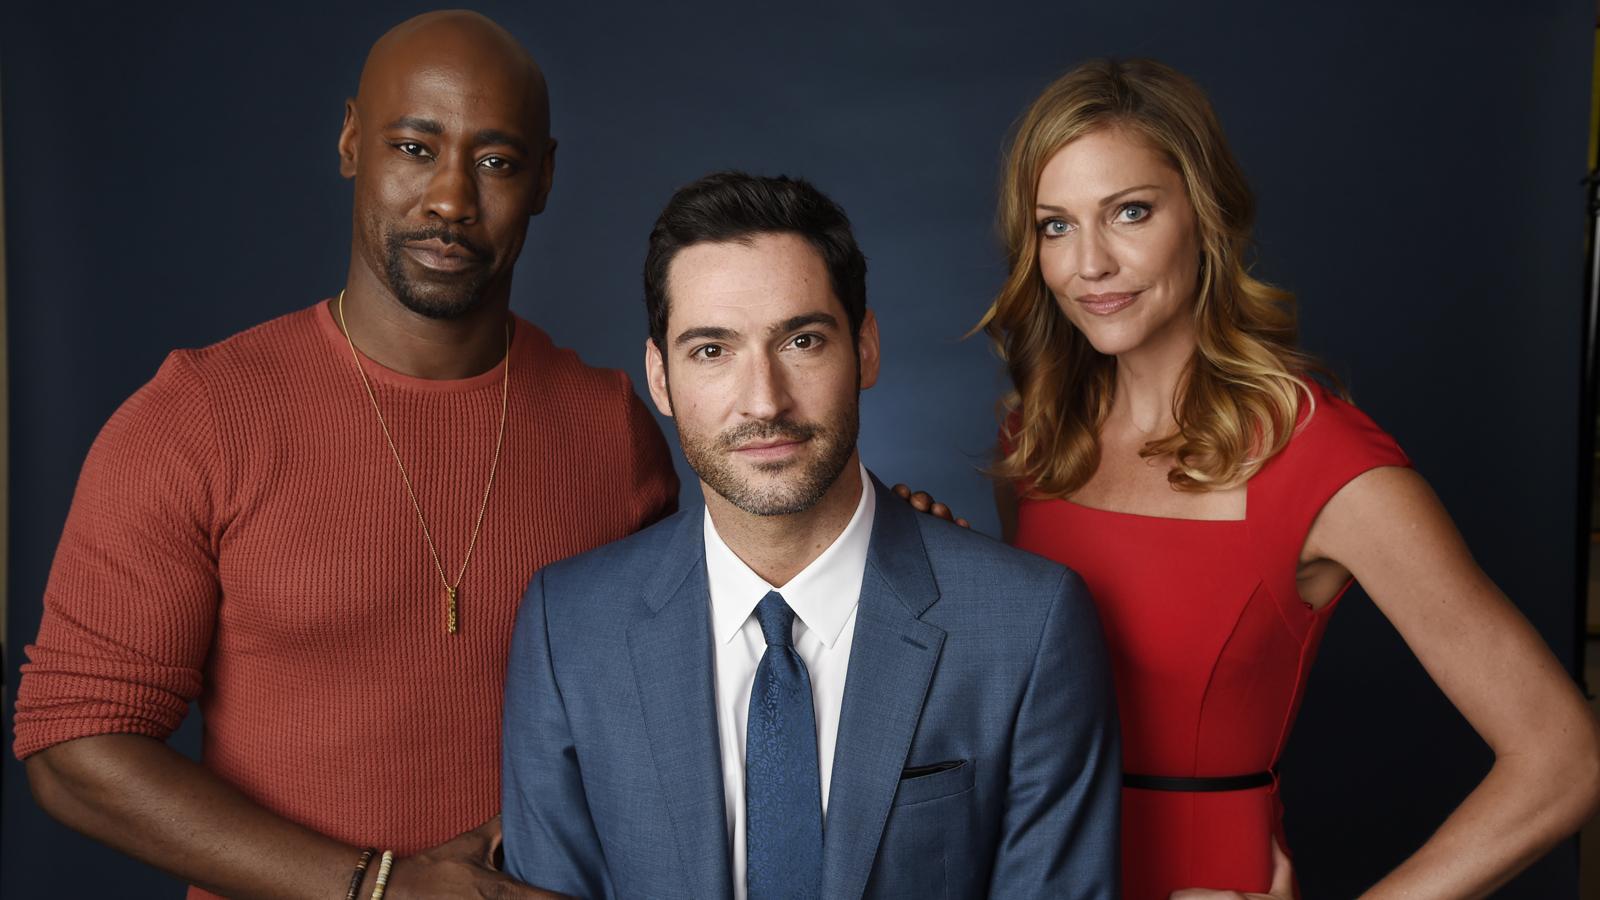 Lucifer Season 4: Release Date, Plot, Trailer, Cast And More